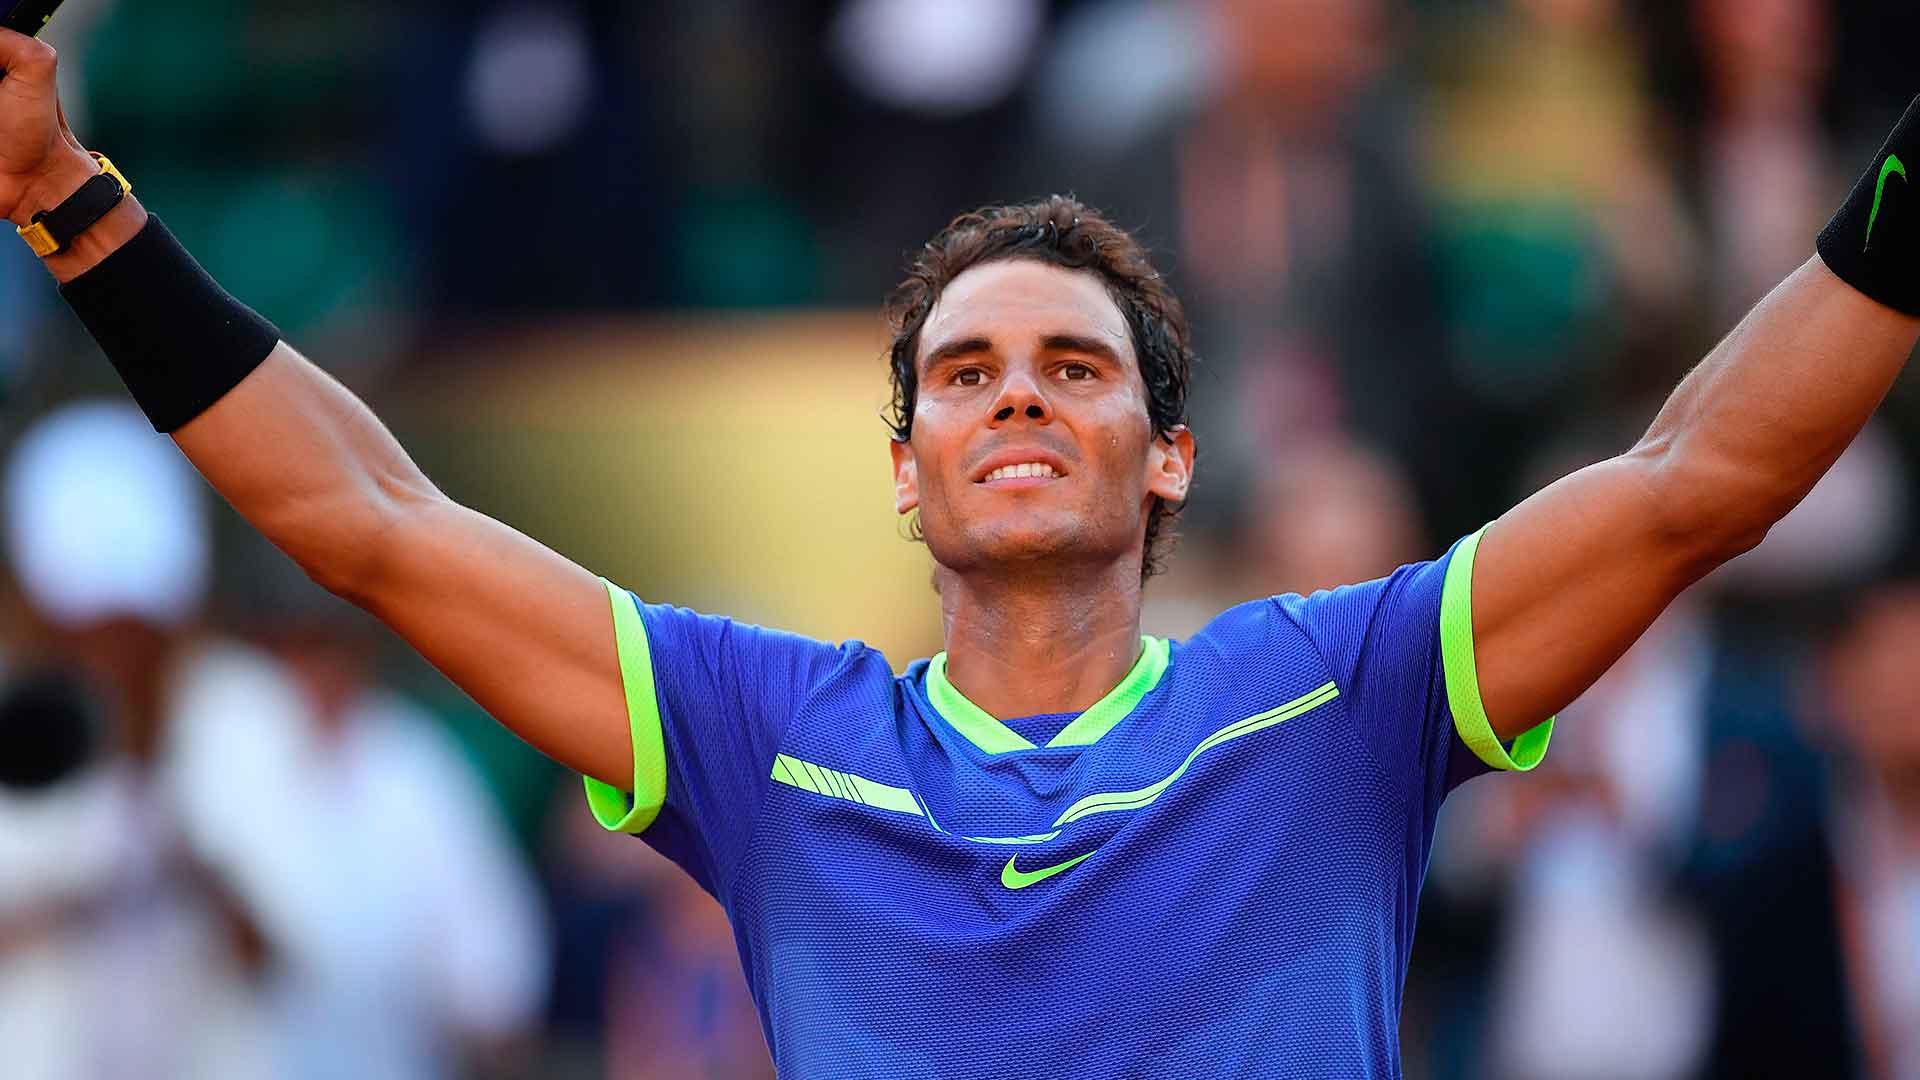 Nadal Reaches 10th Roland Garros Final | South Africa ...